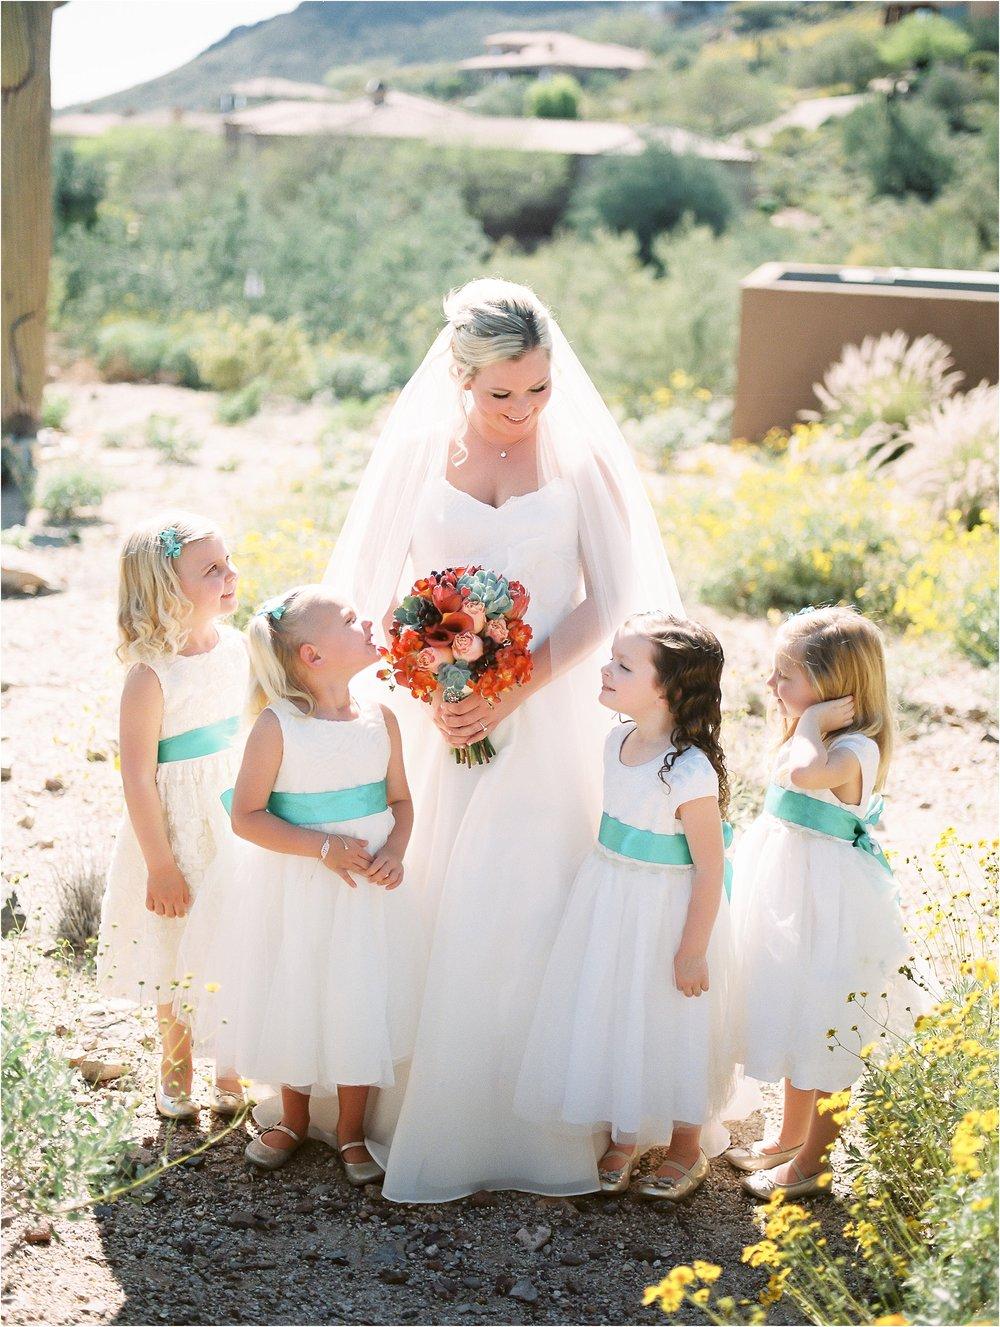 Sarah Jane Photography Film Hybrid Scottsdale Phoenix Arizona Destination Wedding Photographer Scott and Rachel_0011.jpg